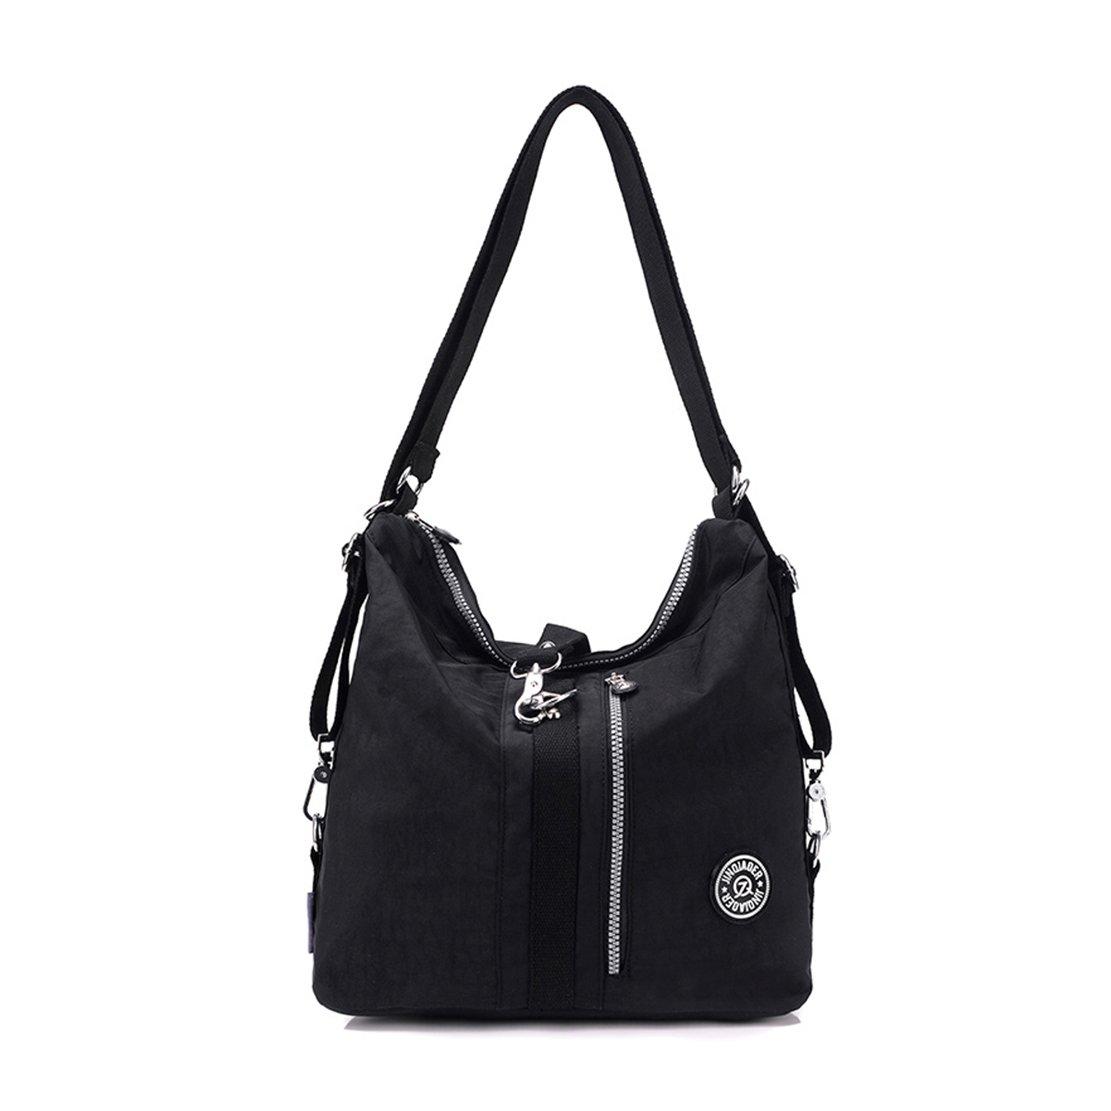 Fashion Waterproof Nylon Casual Travel lightweight Shoulder Bag Crossbody Bag Handbag Purse For Women and Girls